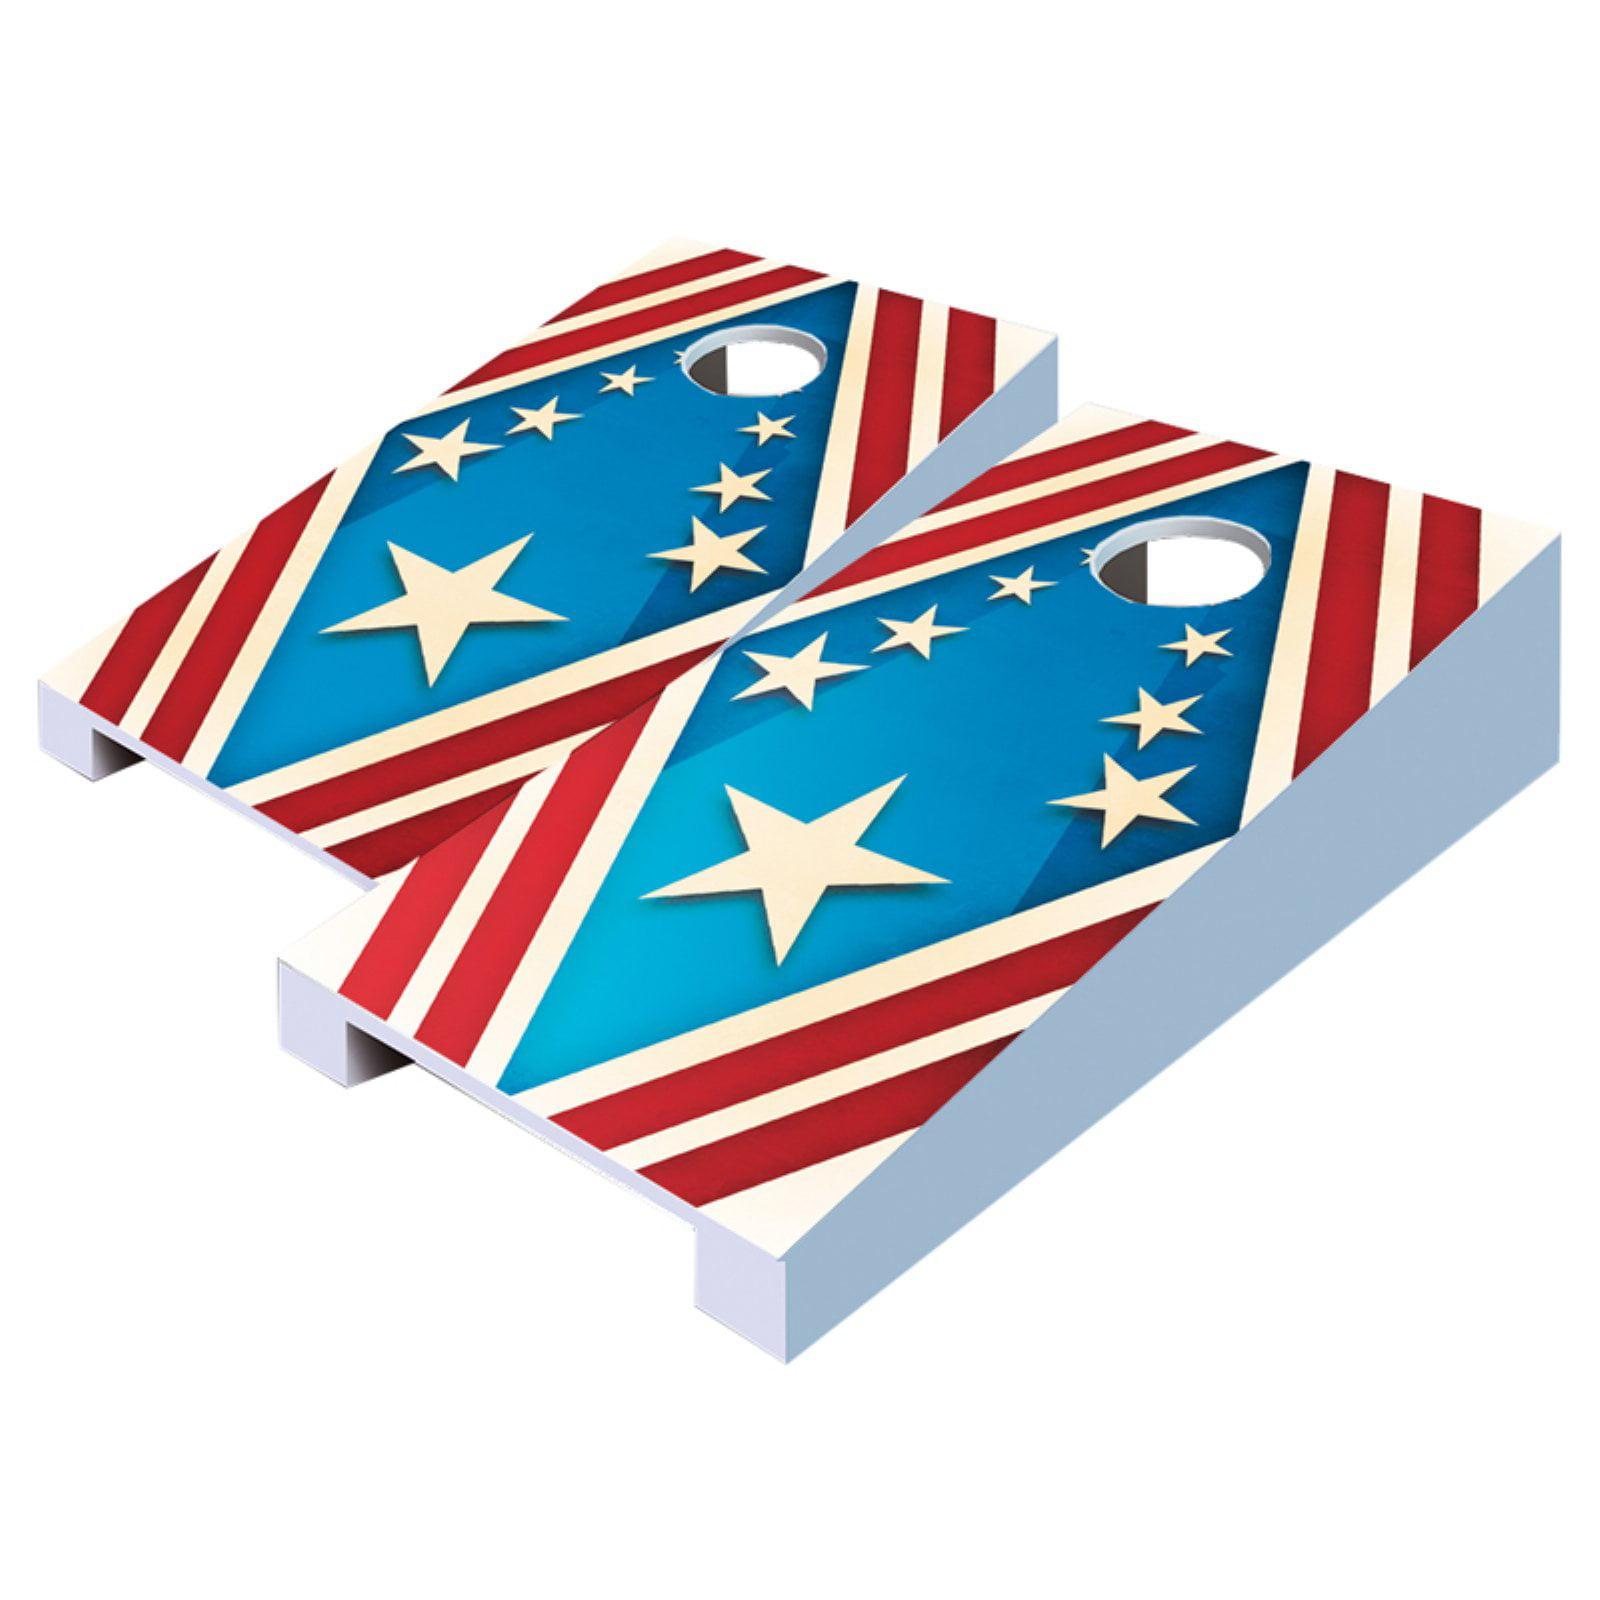 Patriotic Tabletop Cornhole Set by AJJ Cornhole